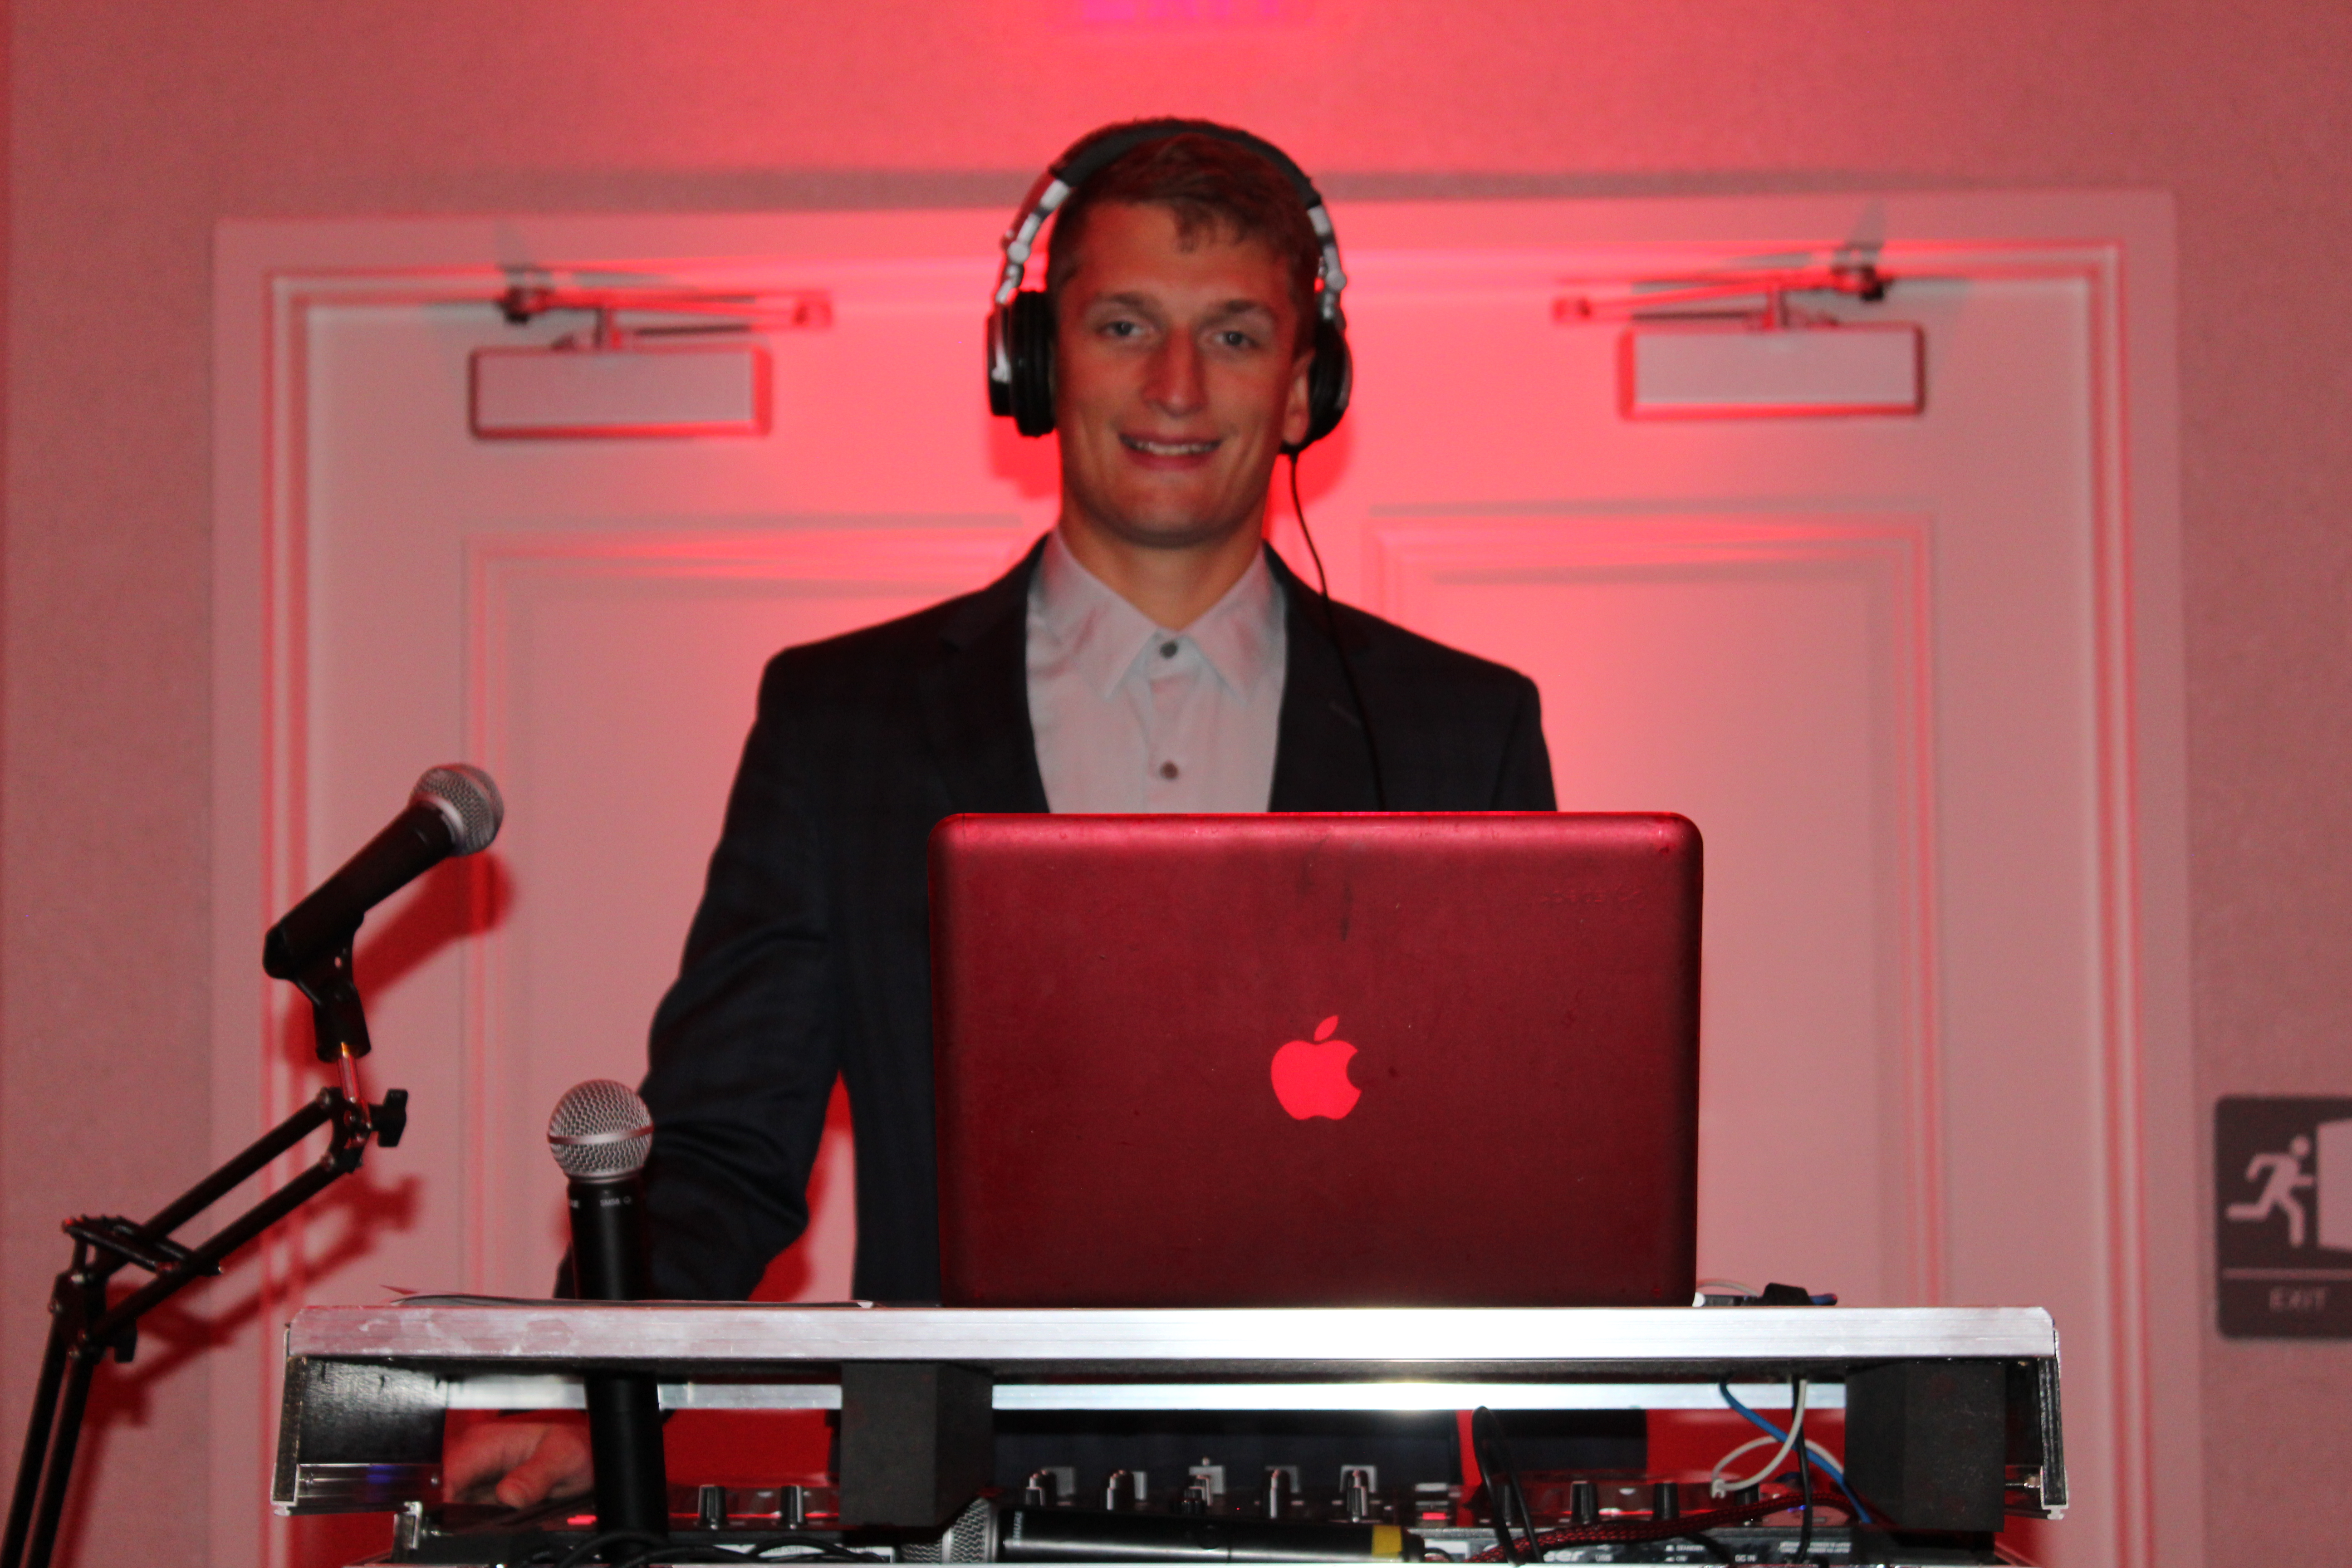 Pro DJ Service Bethlehem PA LV Event